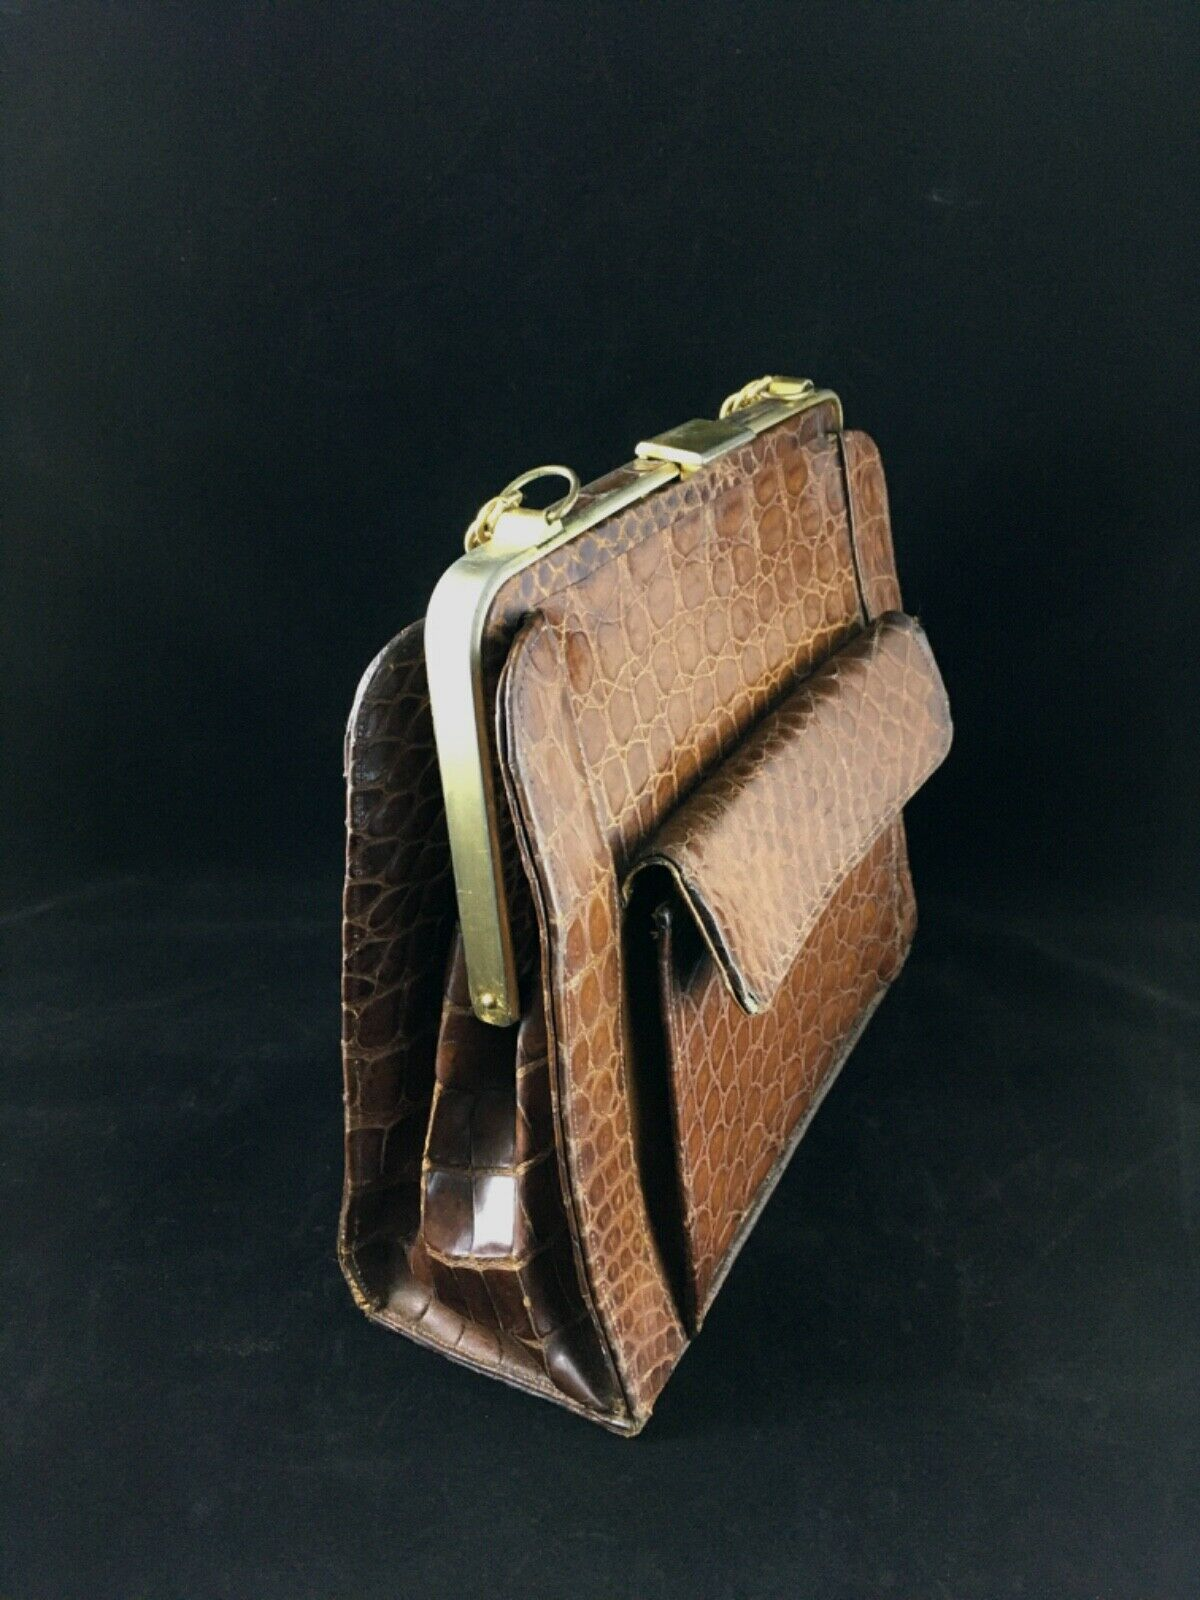 RENDL Original 1960 Vintage Black Leather Handbag  Red Leather Lining  Gold Tone Chain Strap